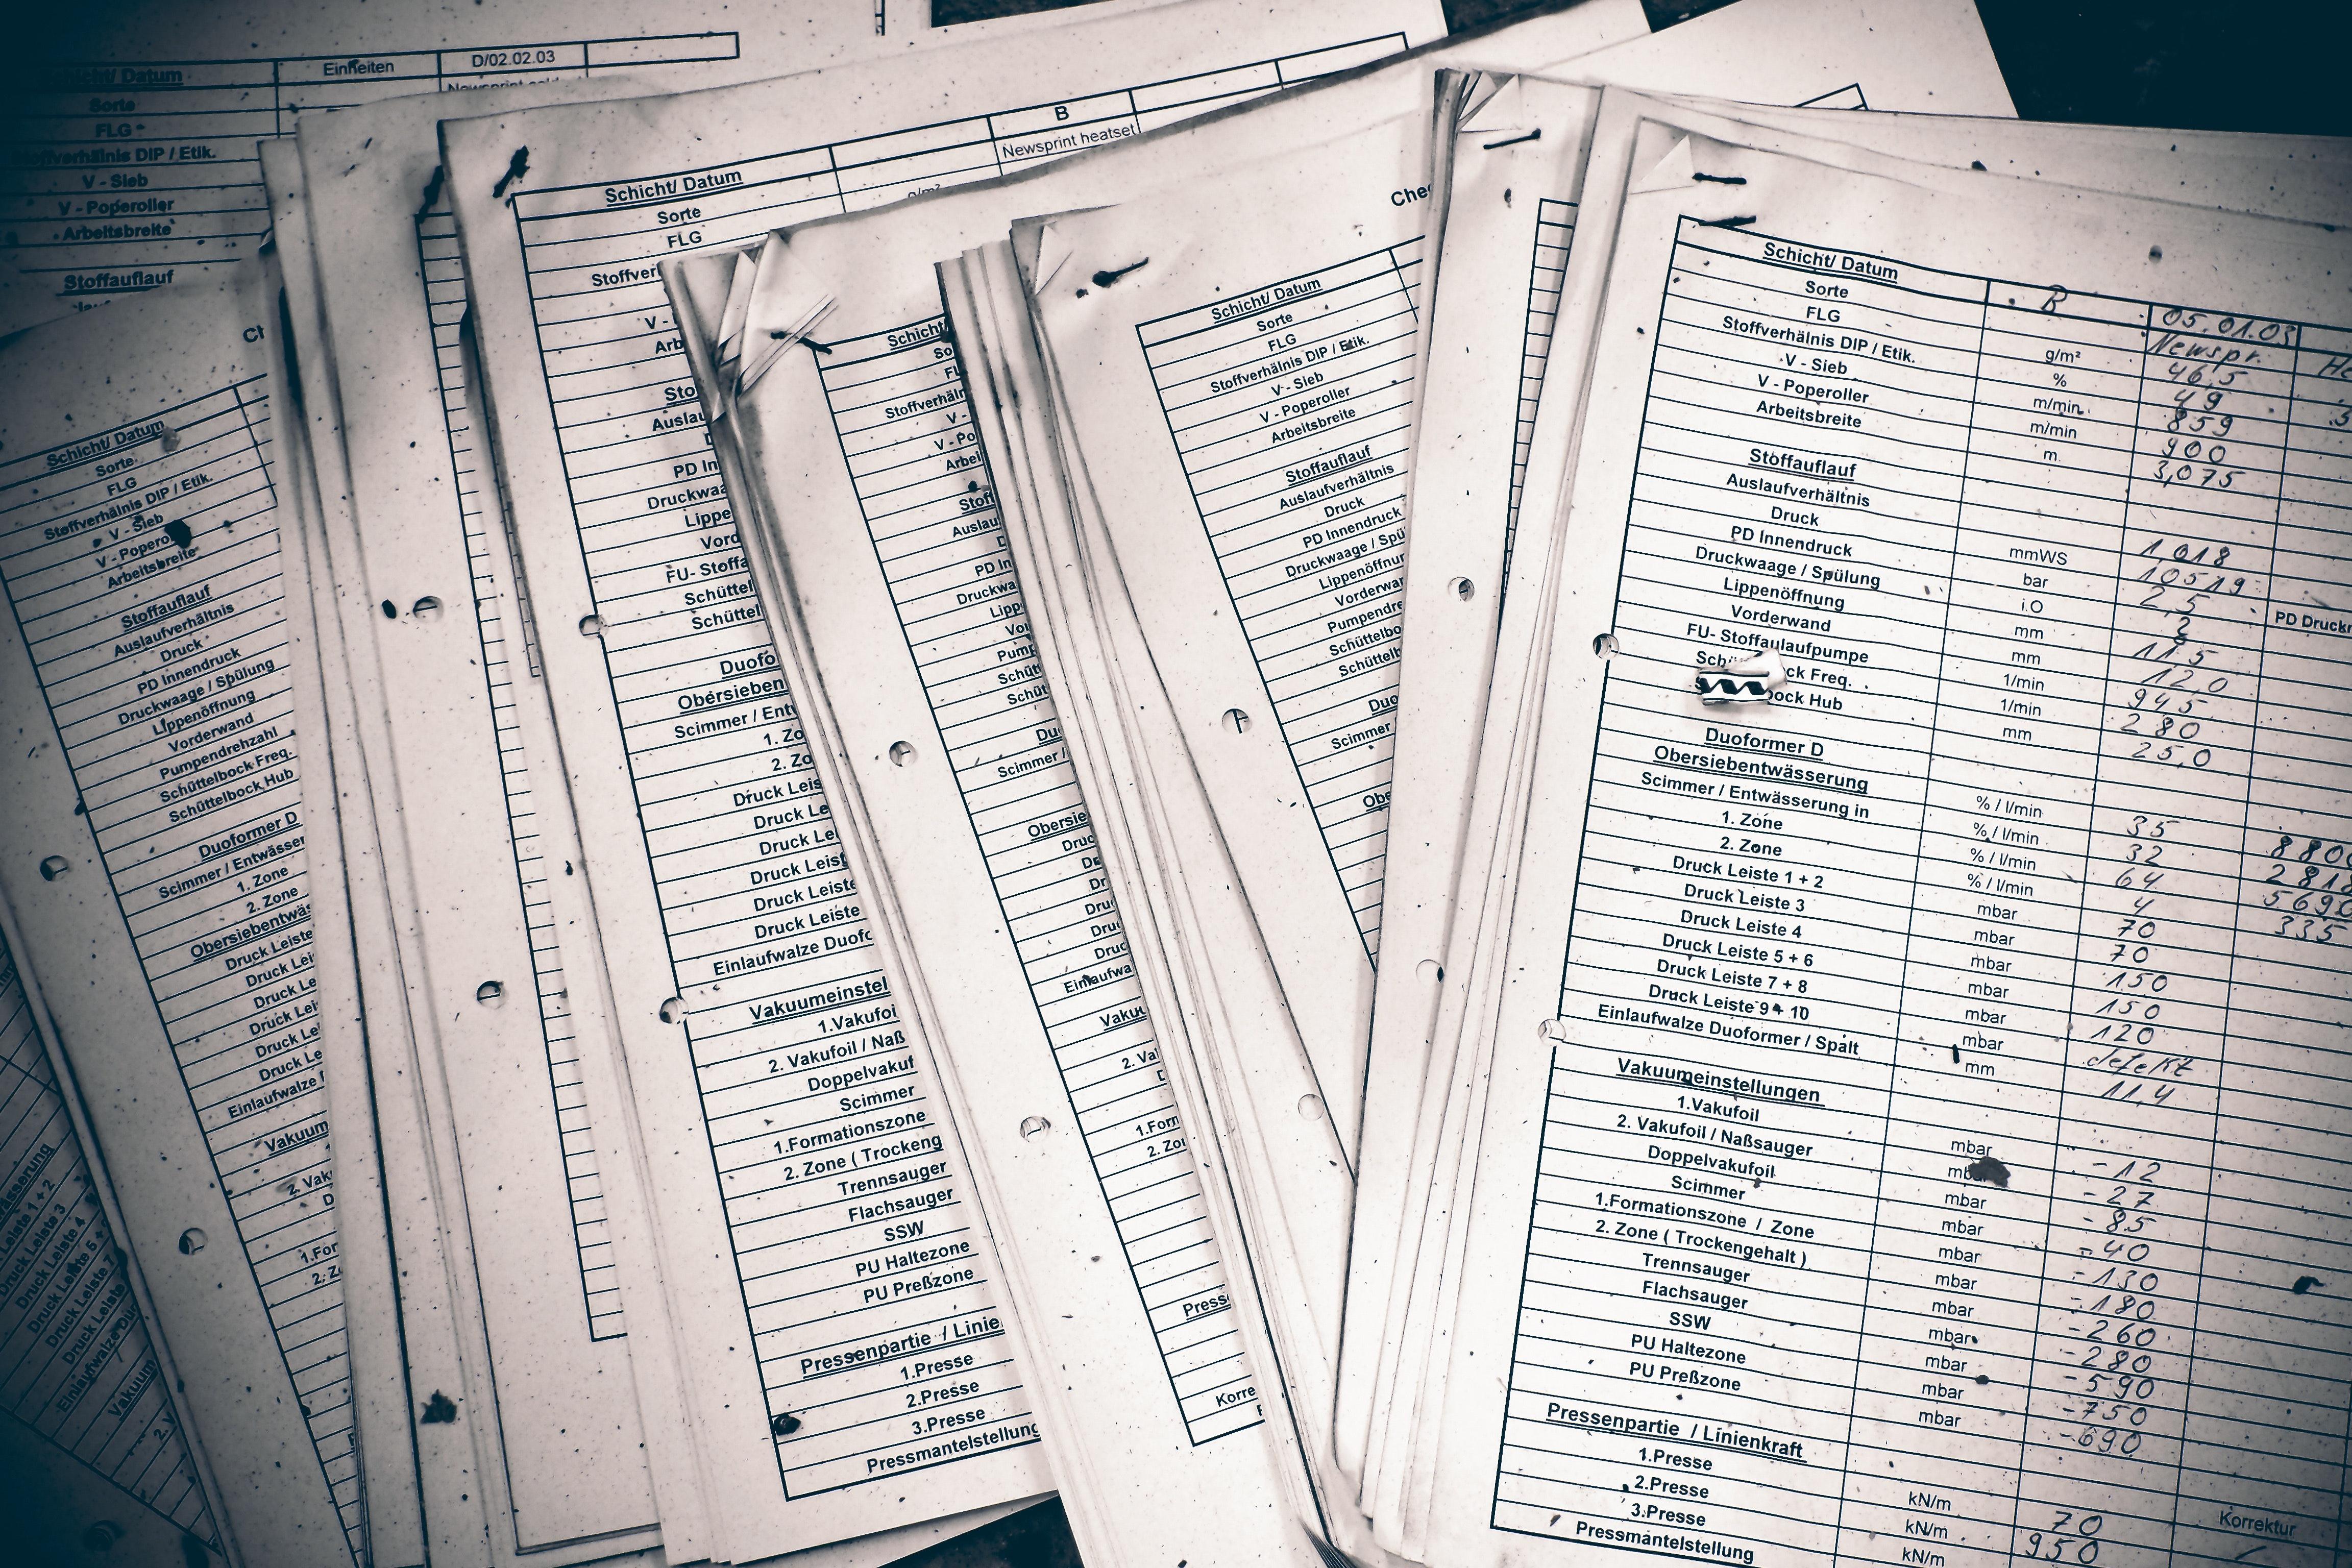 Changing core folder names